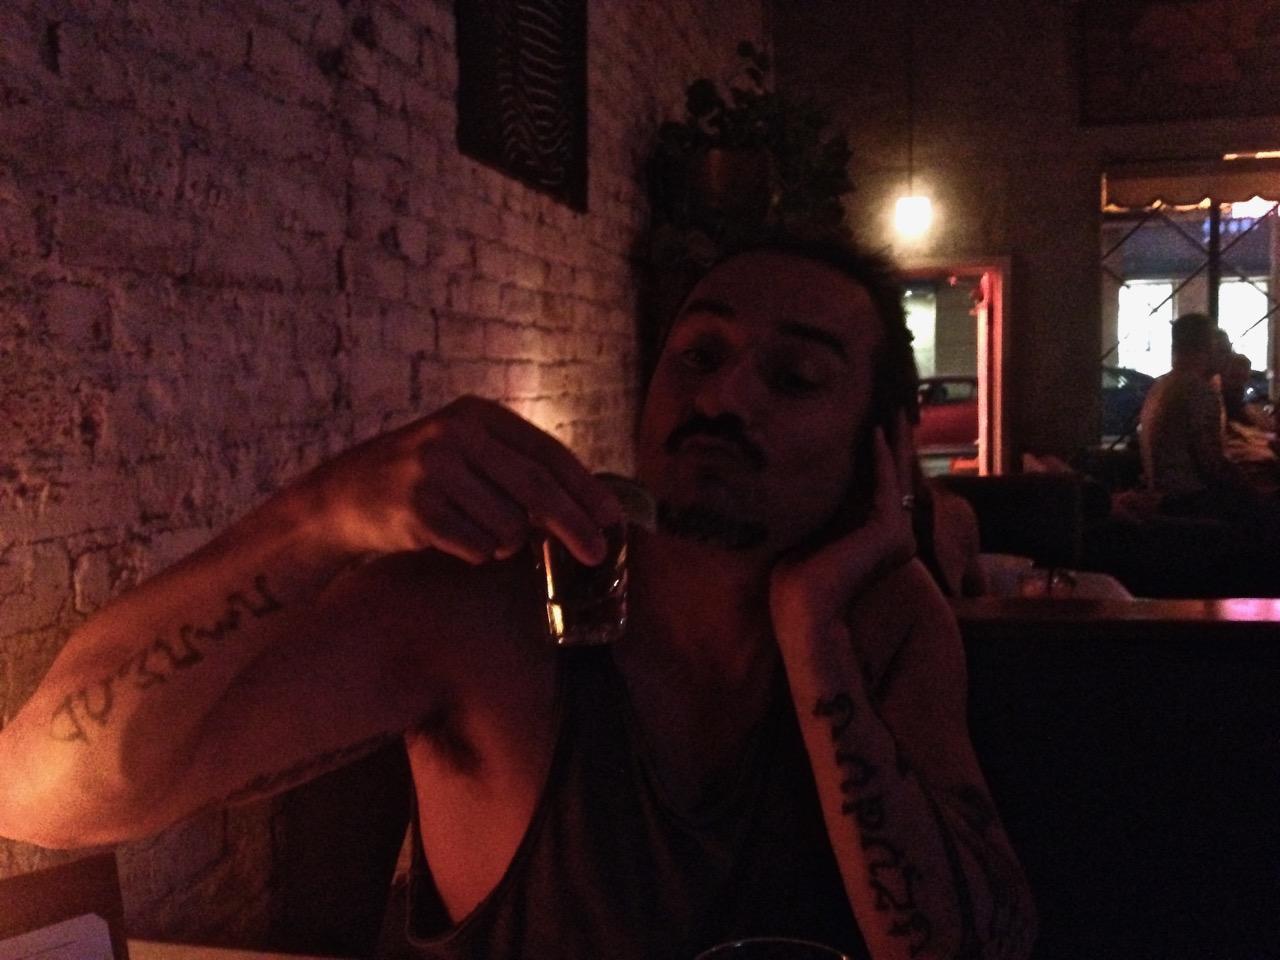 3 Days in L.A. - PowerHouse Legendary Bar (2)